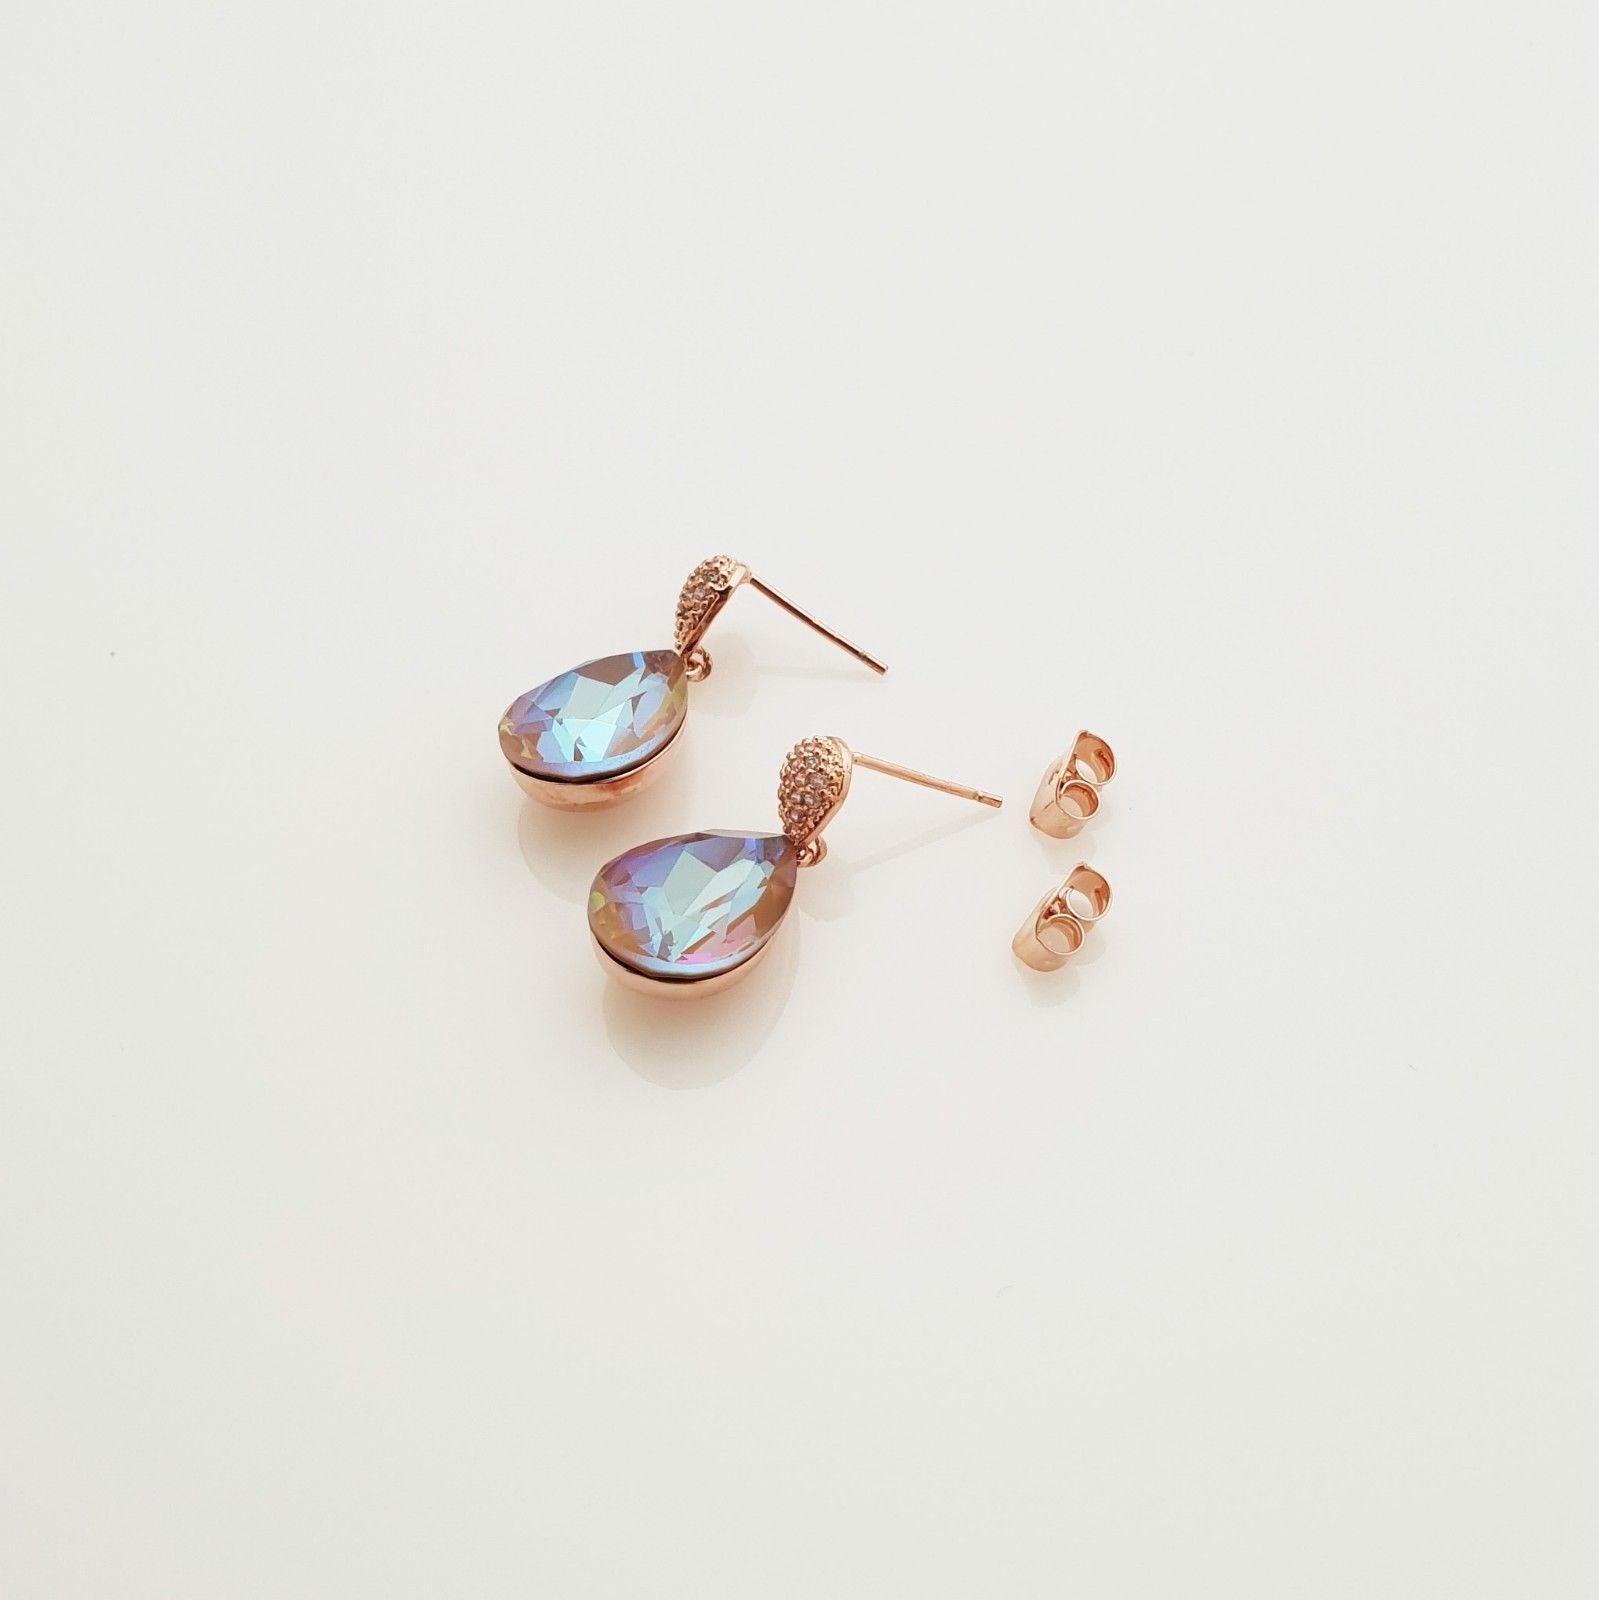 Water Drop Aurora Borealis Made With Swarovski Stone Dangle Earrings 925 Silver image 4